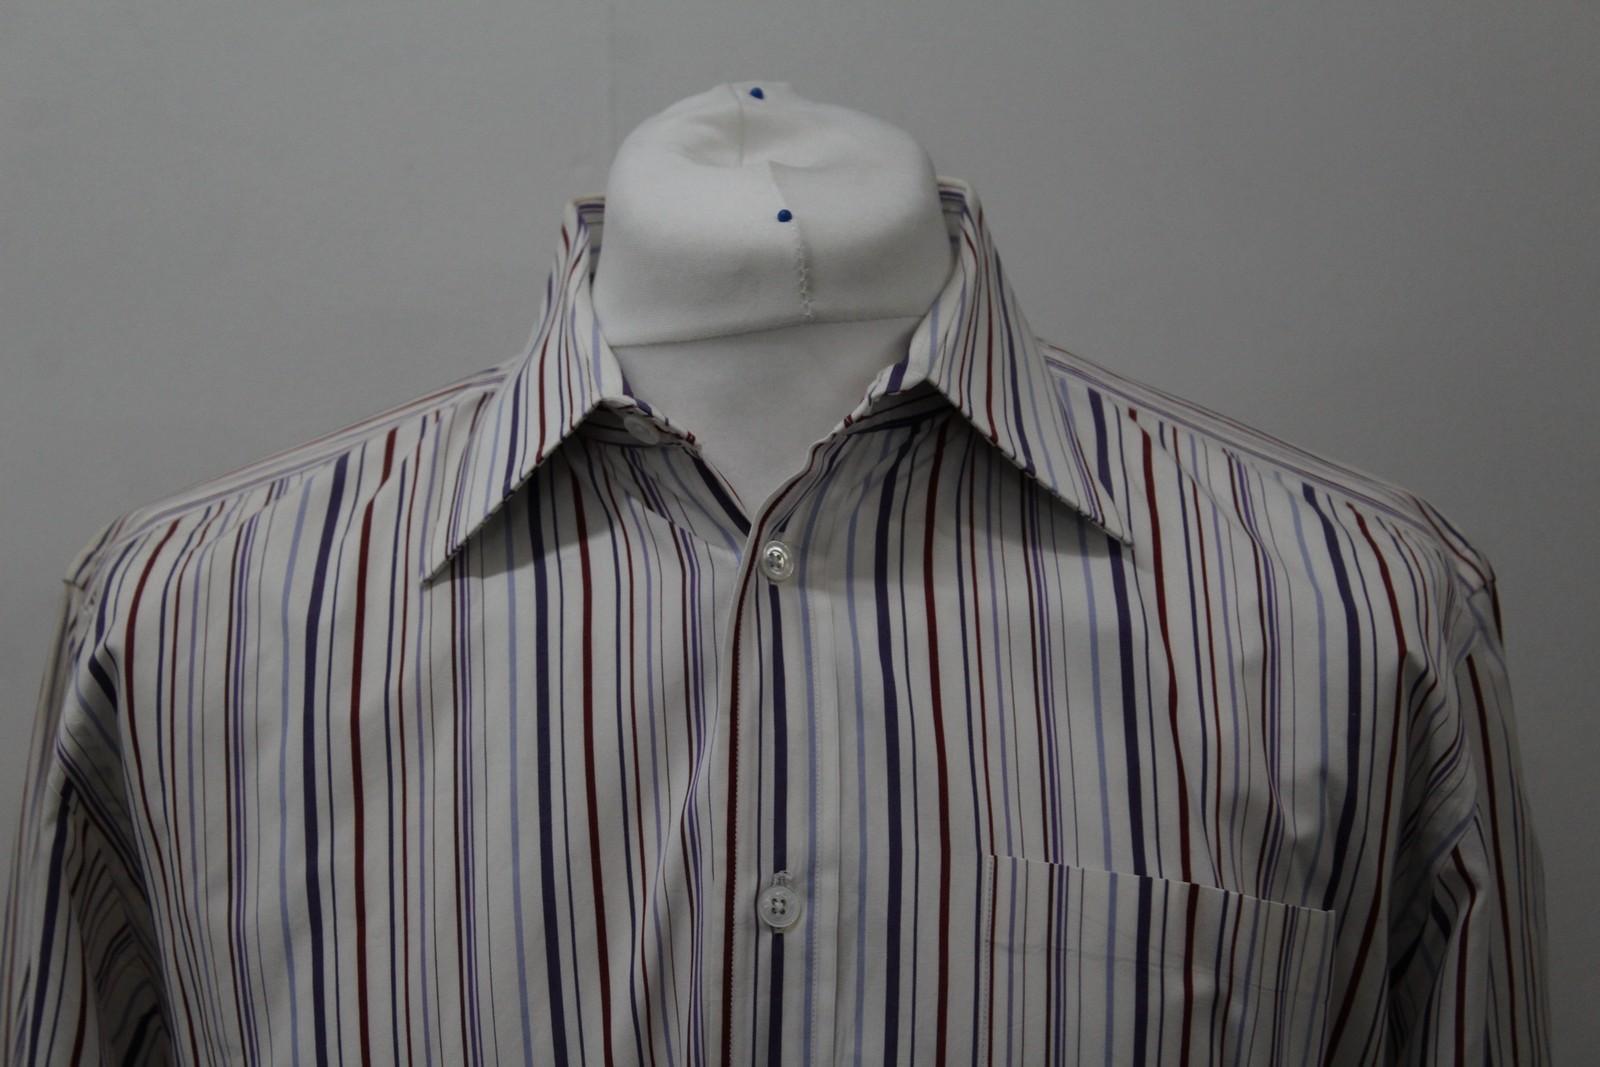 Hermes-para-hombre-Multi-Color-a-rayas-de-algodon-camisa-de-mangas-largas-cuello-16-5-034-42cm miniatura 3